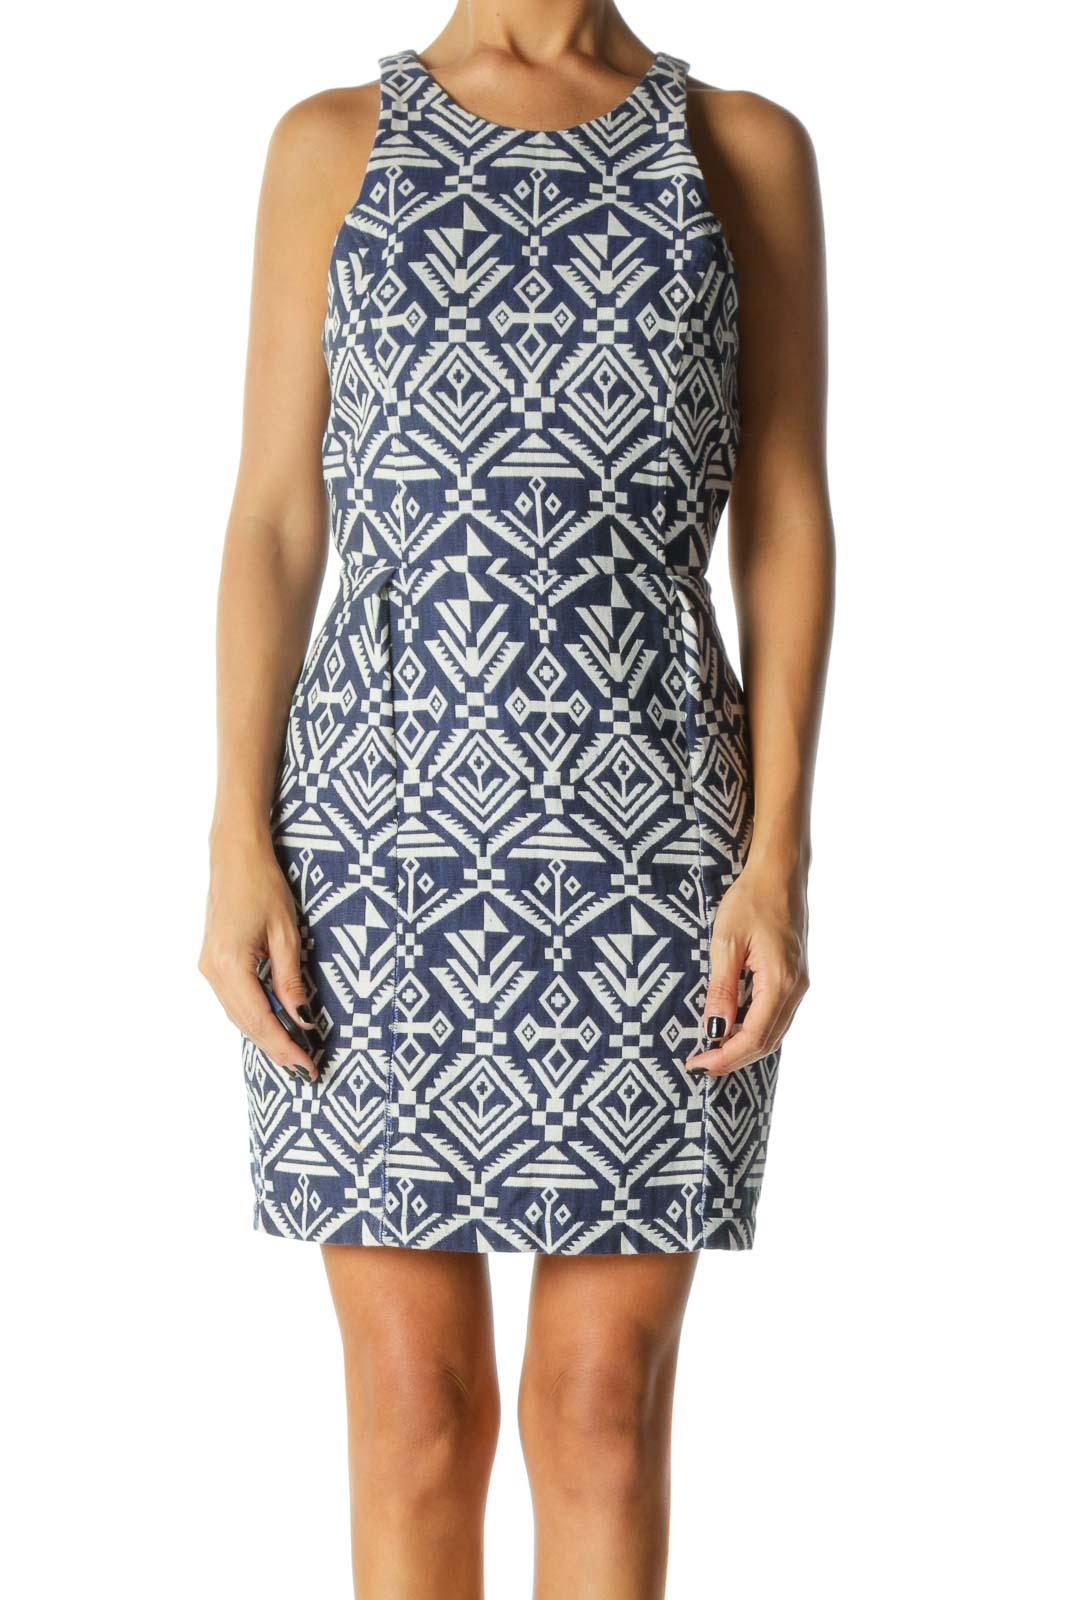 Blue & White Aztec Print Sleeveless Day Dress Front